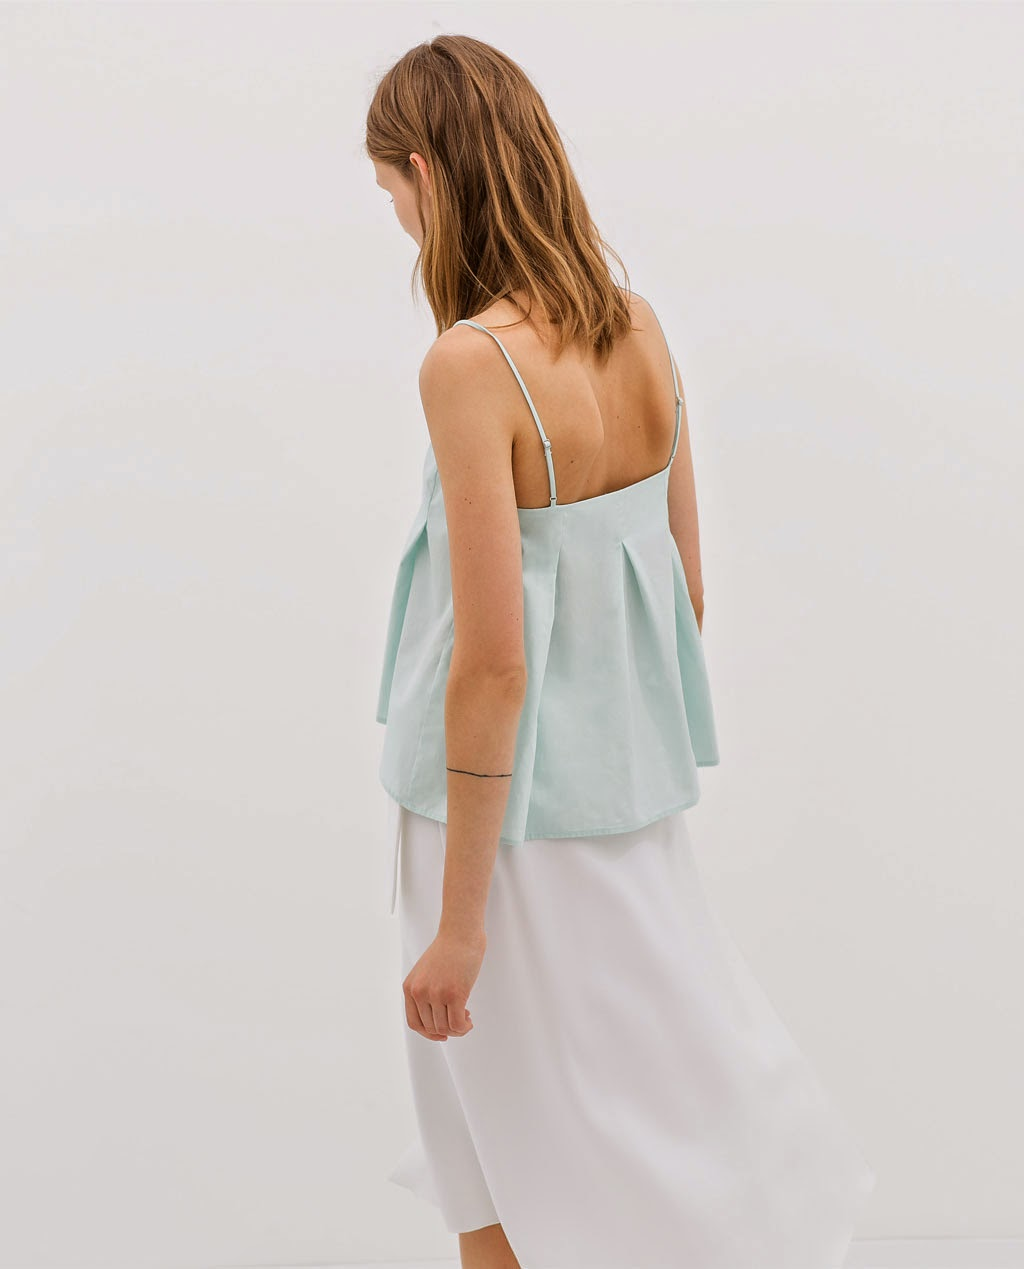 Top, Zara, street style, green, blue, style